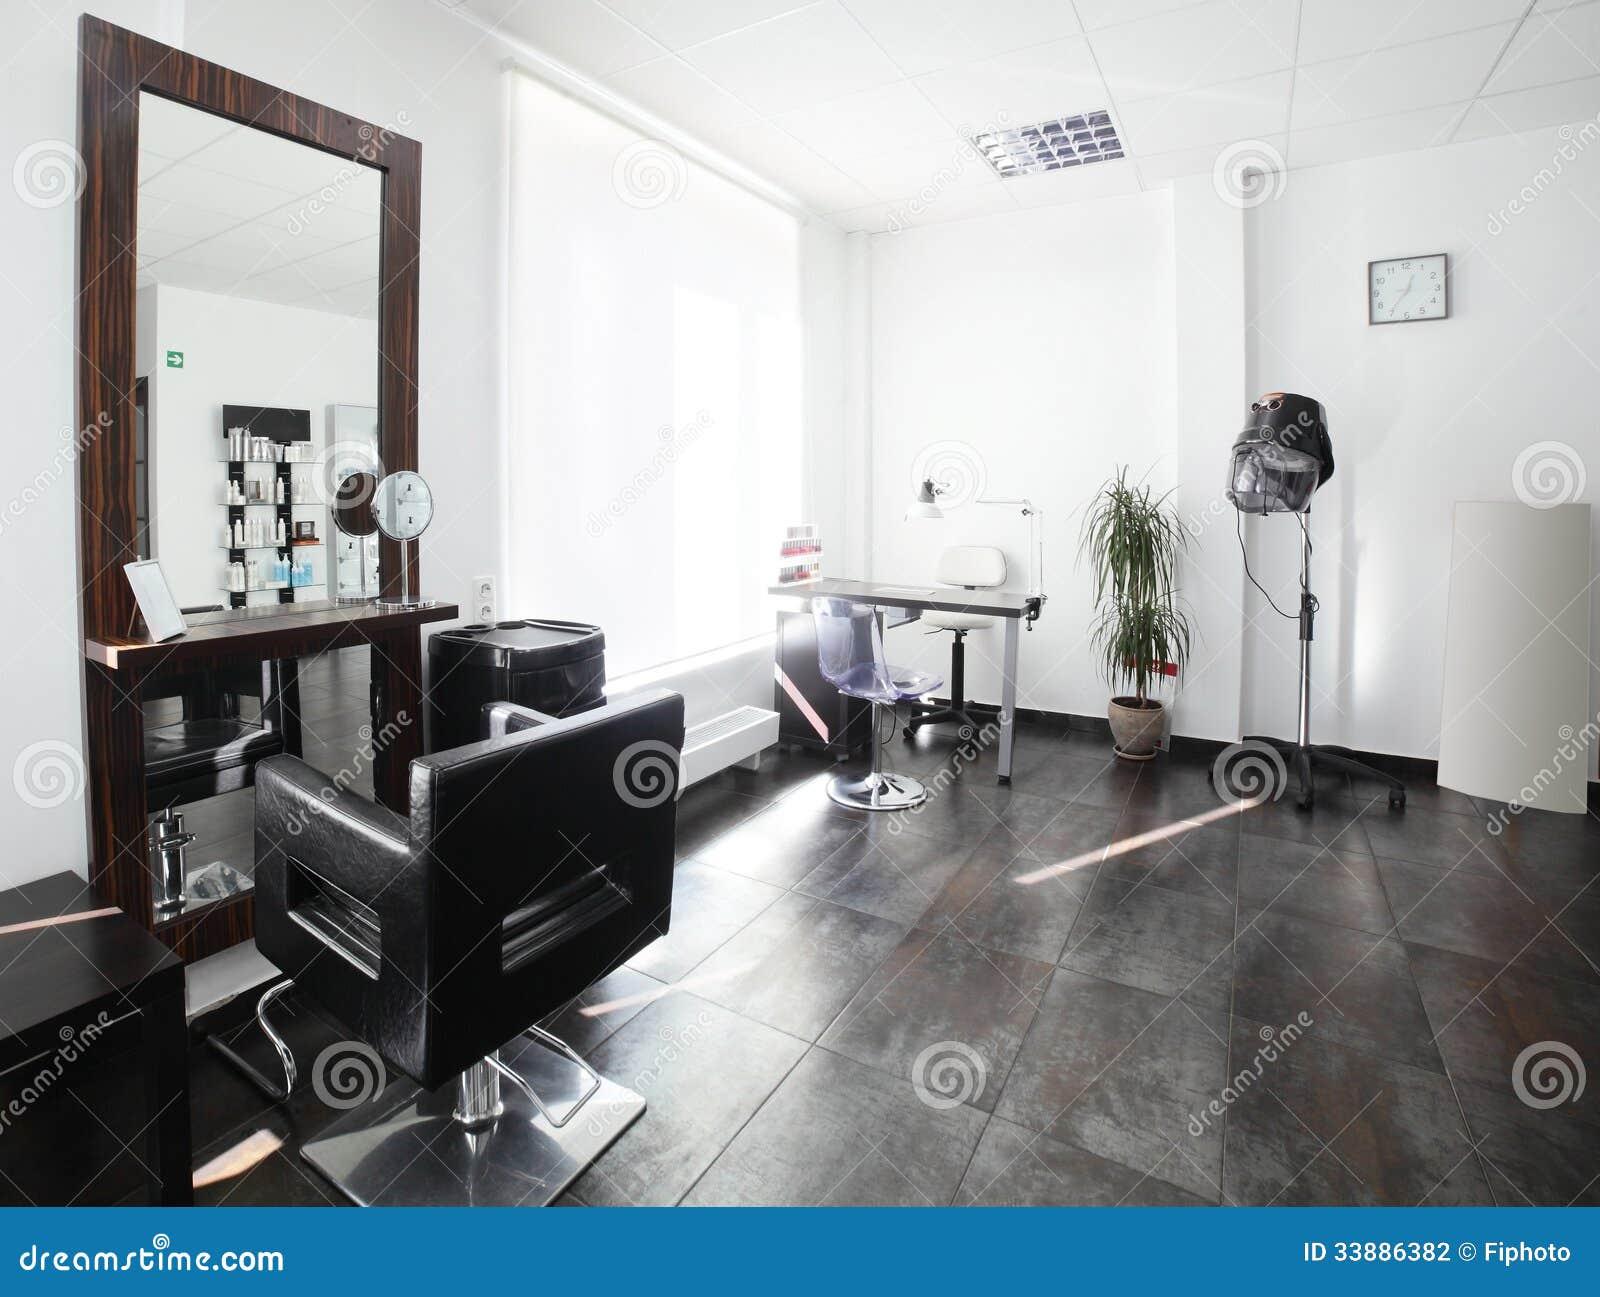 Clean european hair salon stock photo. Image of attractive - 33886382